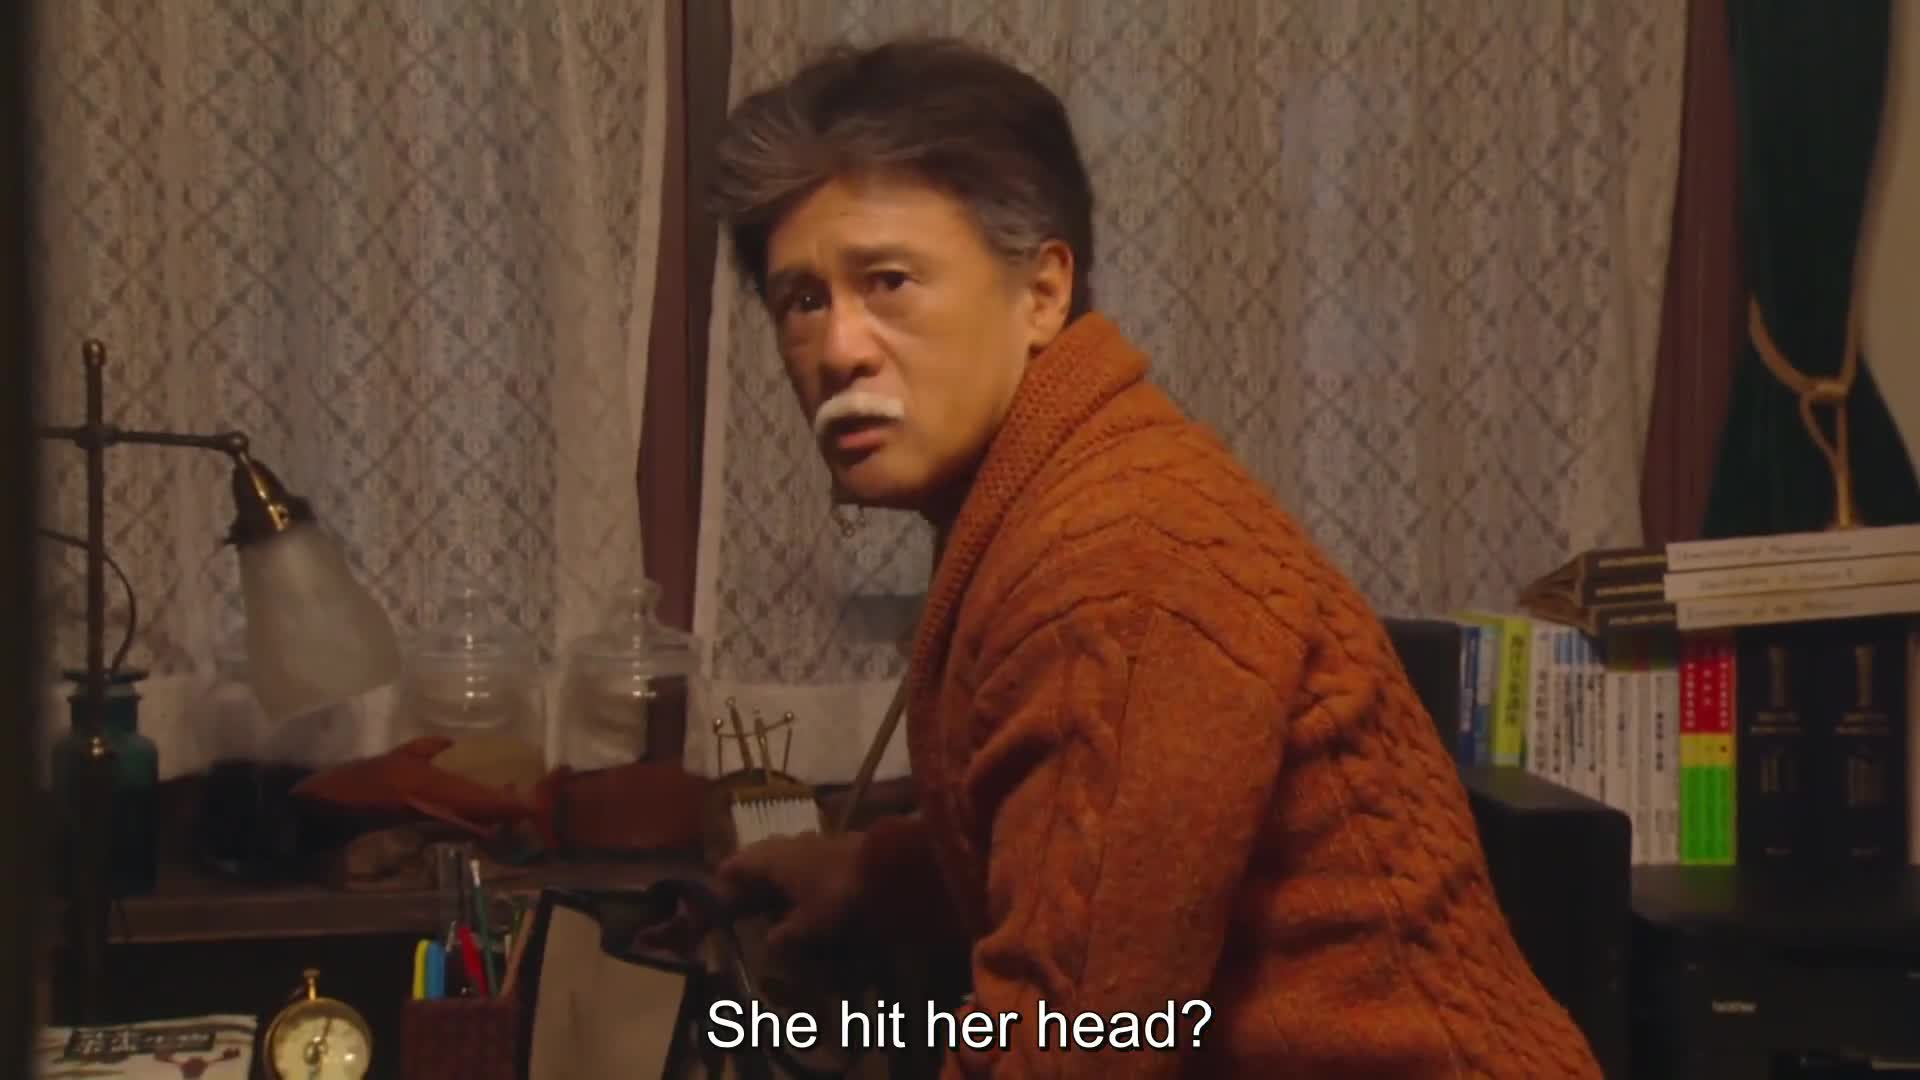 Koi wa Deep ni (2021)